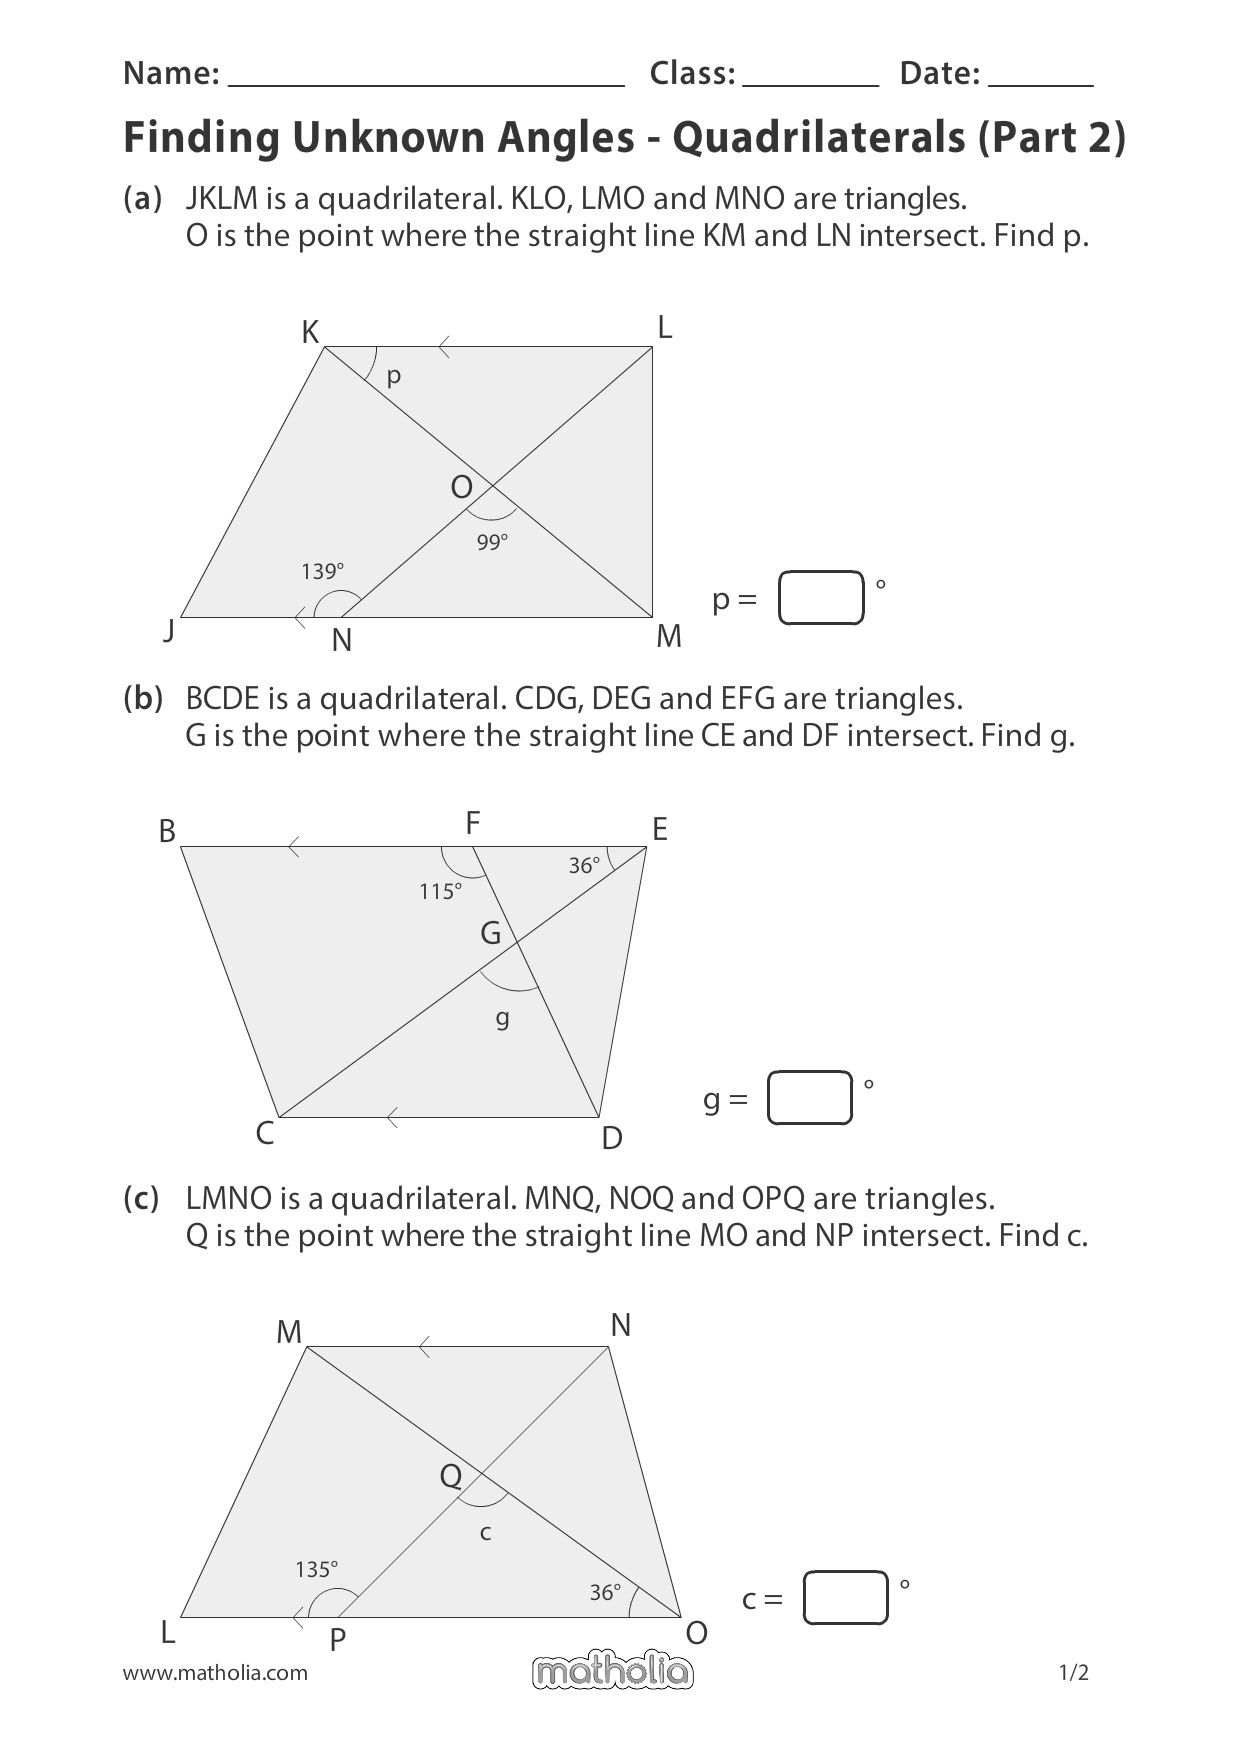 Matholia Printable Worksheet For Grade 6 With Answer Key